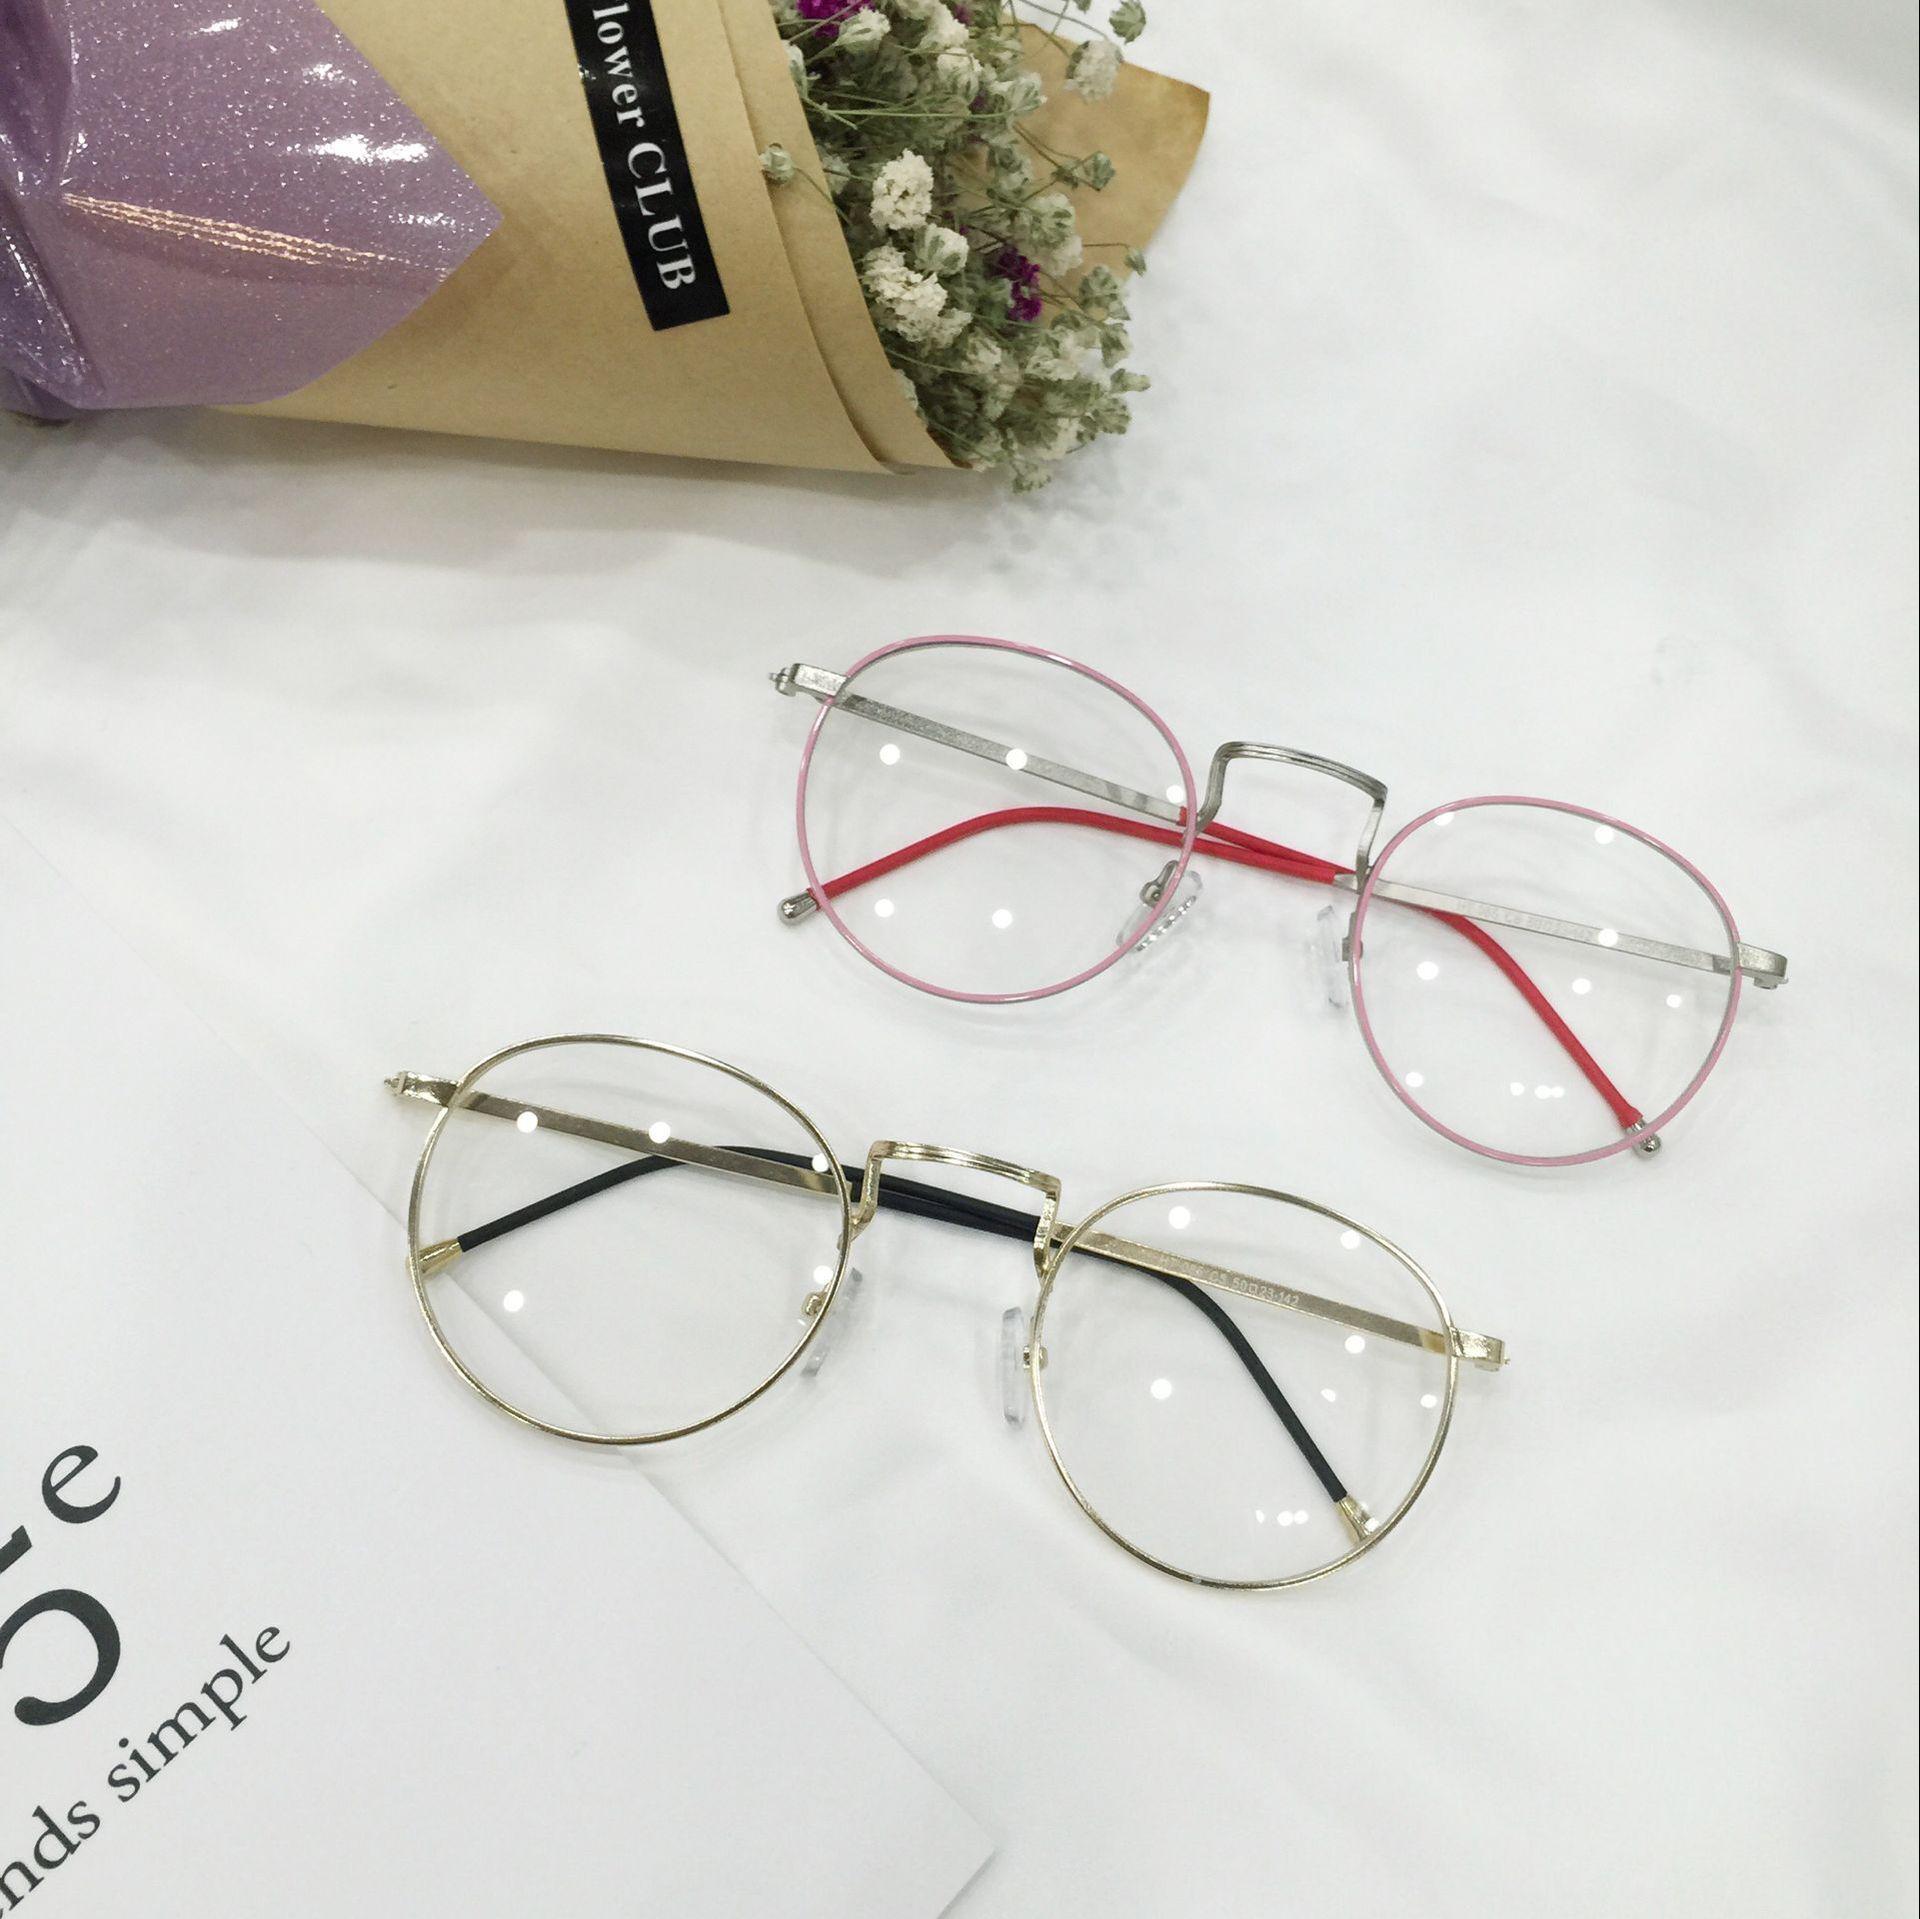 Glasses New Sunglasses Gradient Sunglass QRQ-01-QRQ-10